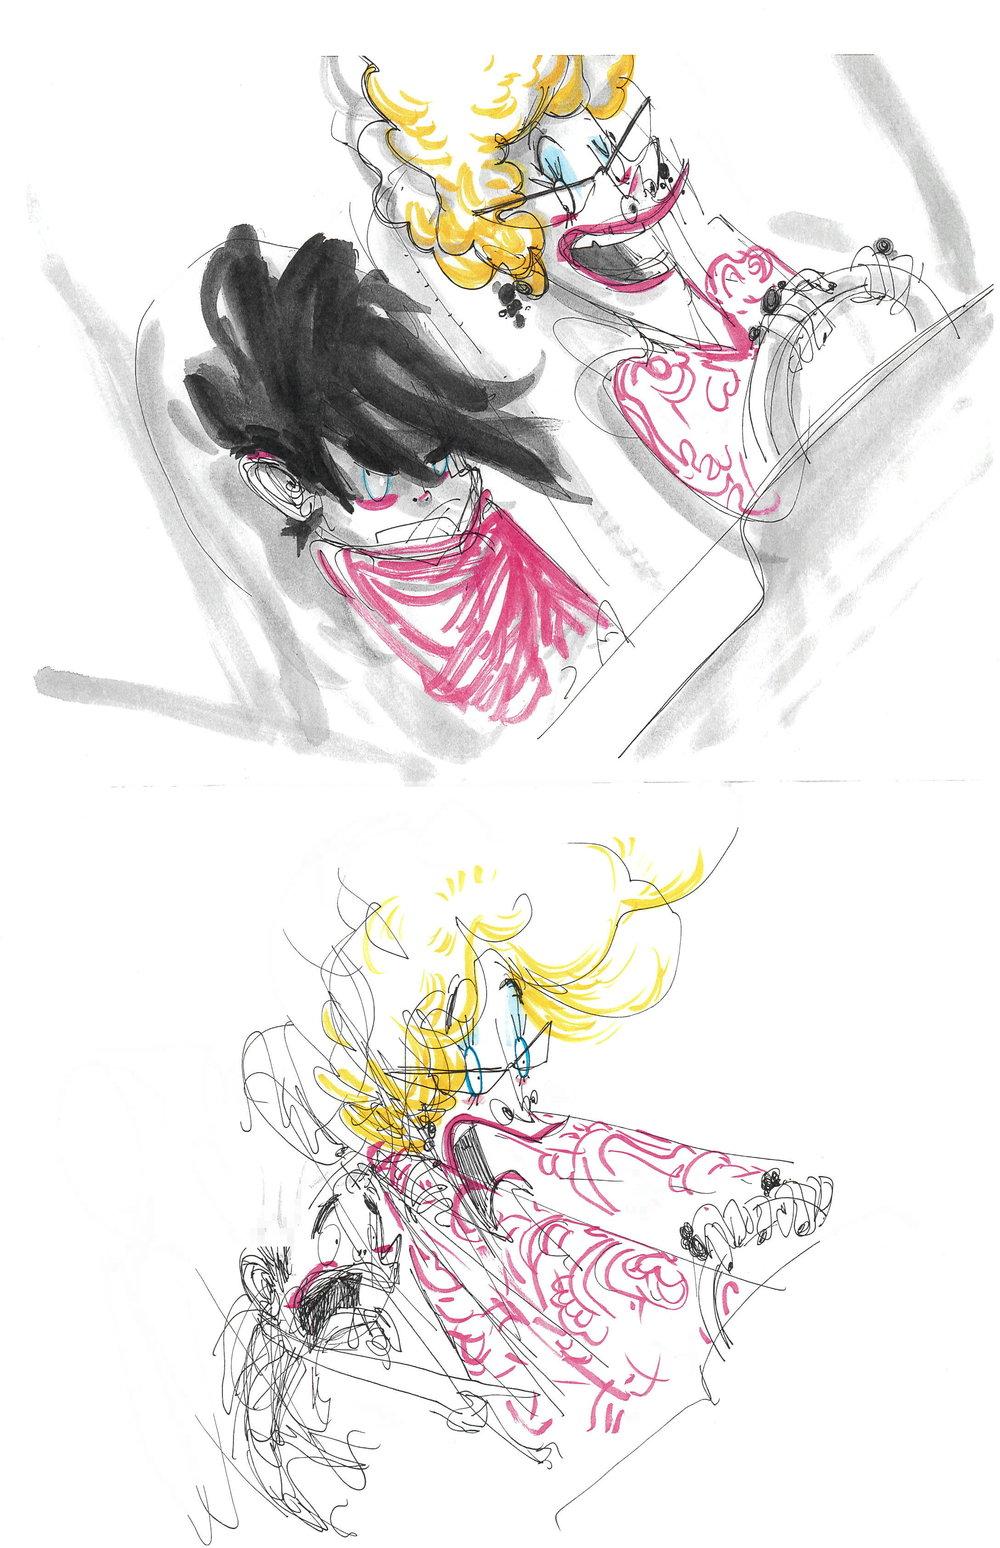 BRIANWONDERS-sketches-1_Page_13_Image_0001.jpg